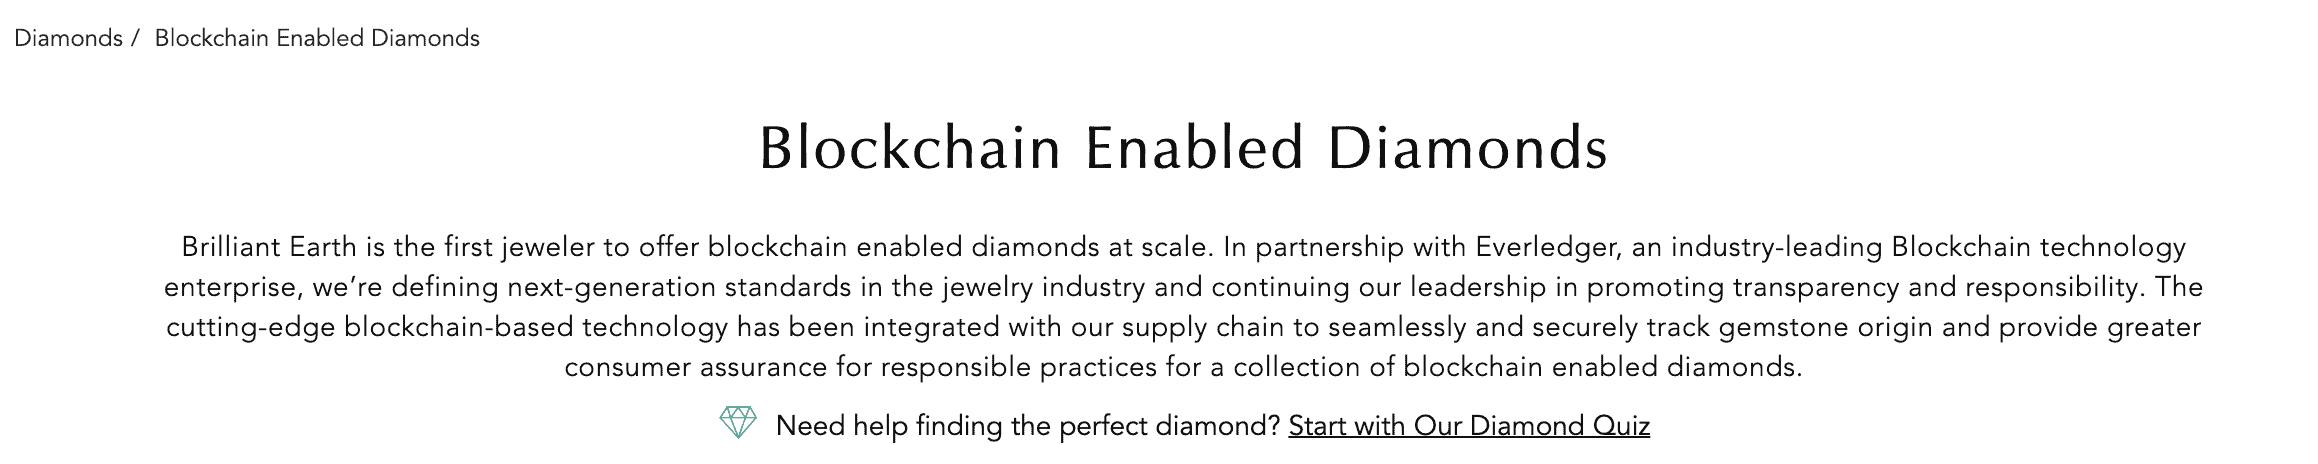 blockchain enabled diamonds info